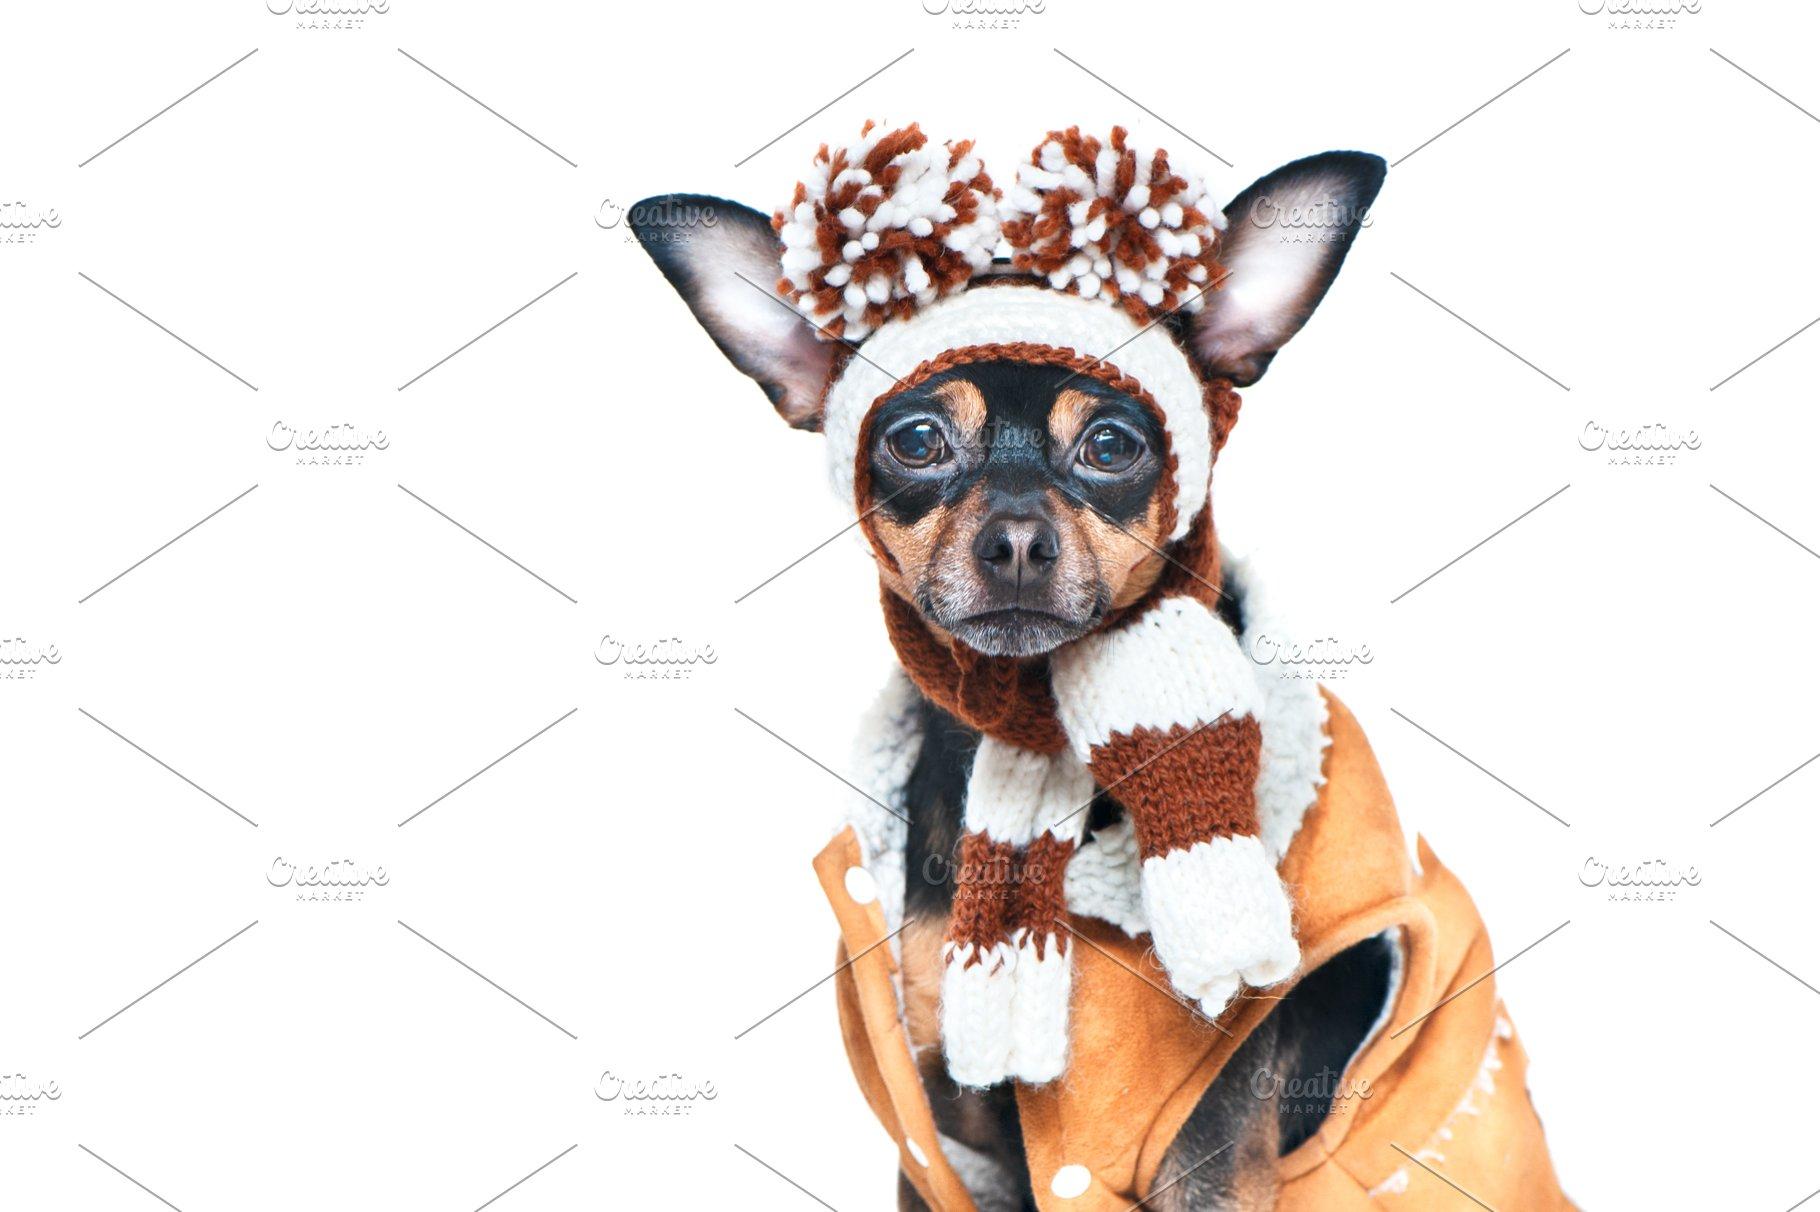 b2fecbca Funny puppy, a dog in a winter hat ~ Animal Photos ~ Creative Market